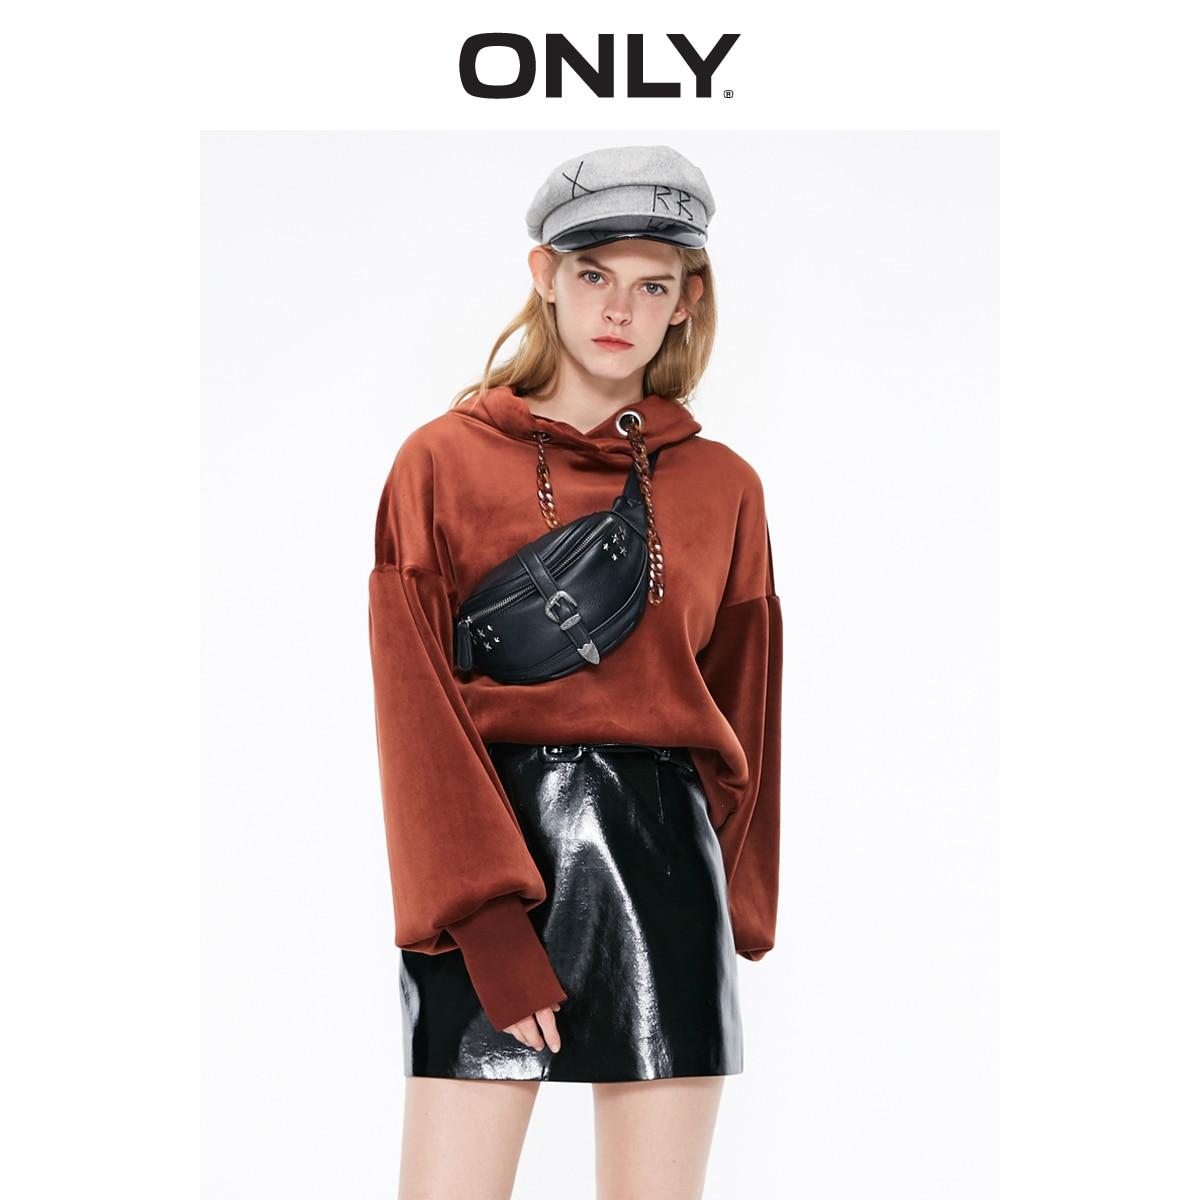 ONLY Women's  Autumn New Solid Color Retro Velvet Loose Hooded Round Neck Hoodie Sweatshirt |11919S522